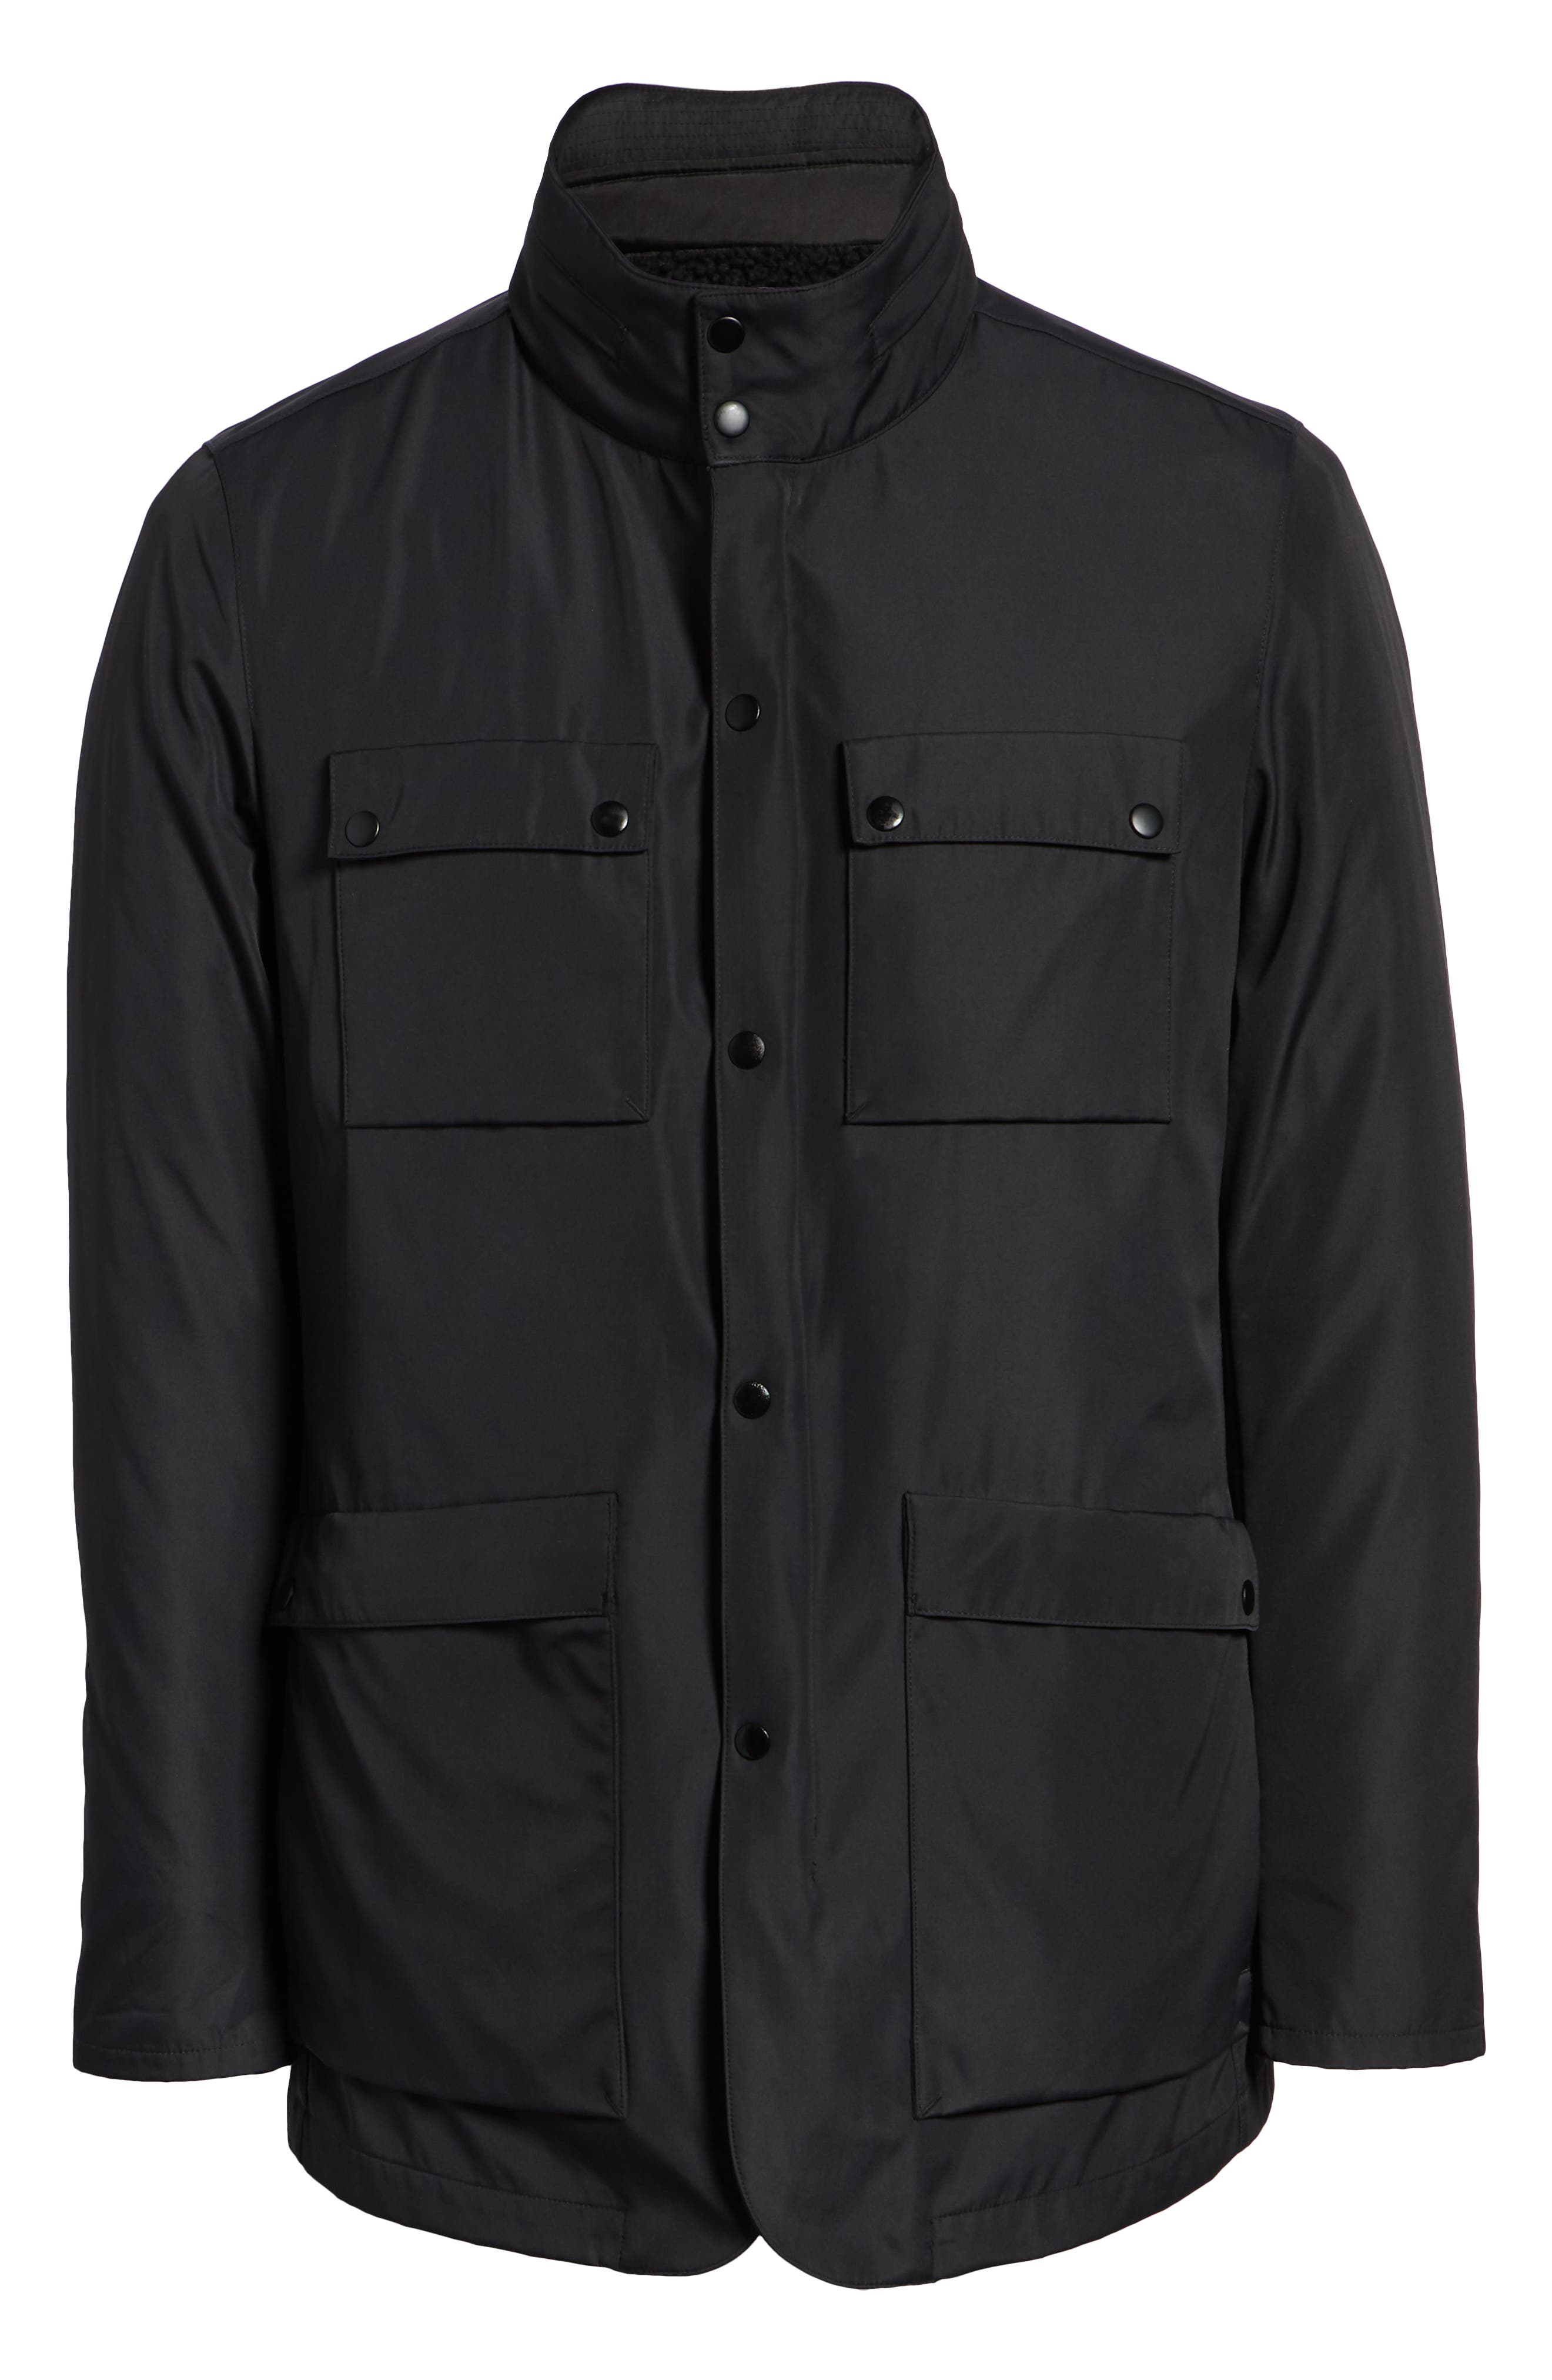 Oak 3-in-1 Jacket,                             Alternate thumbnail 7, color,                             BLACK